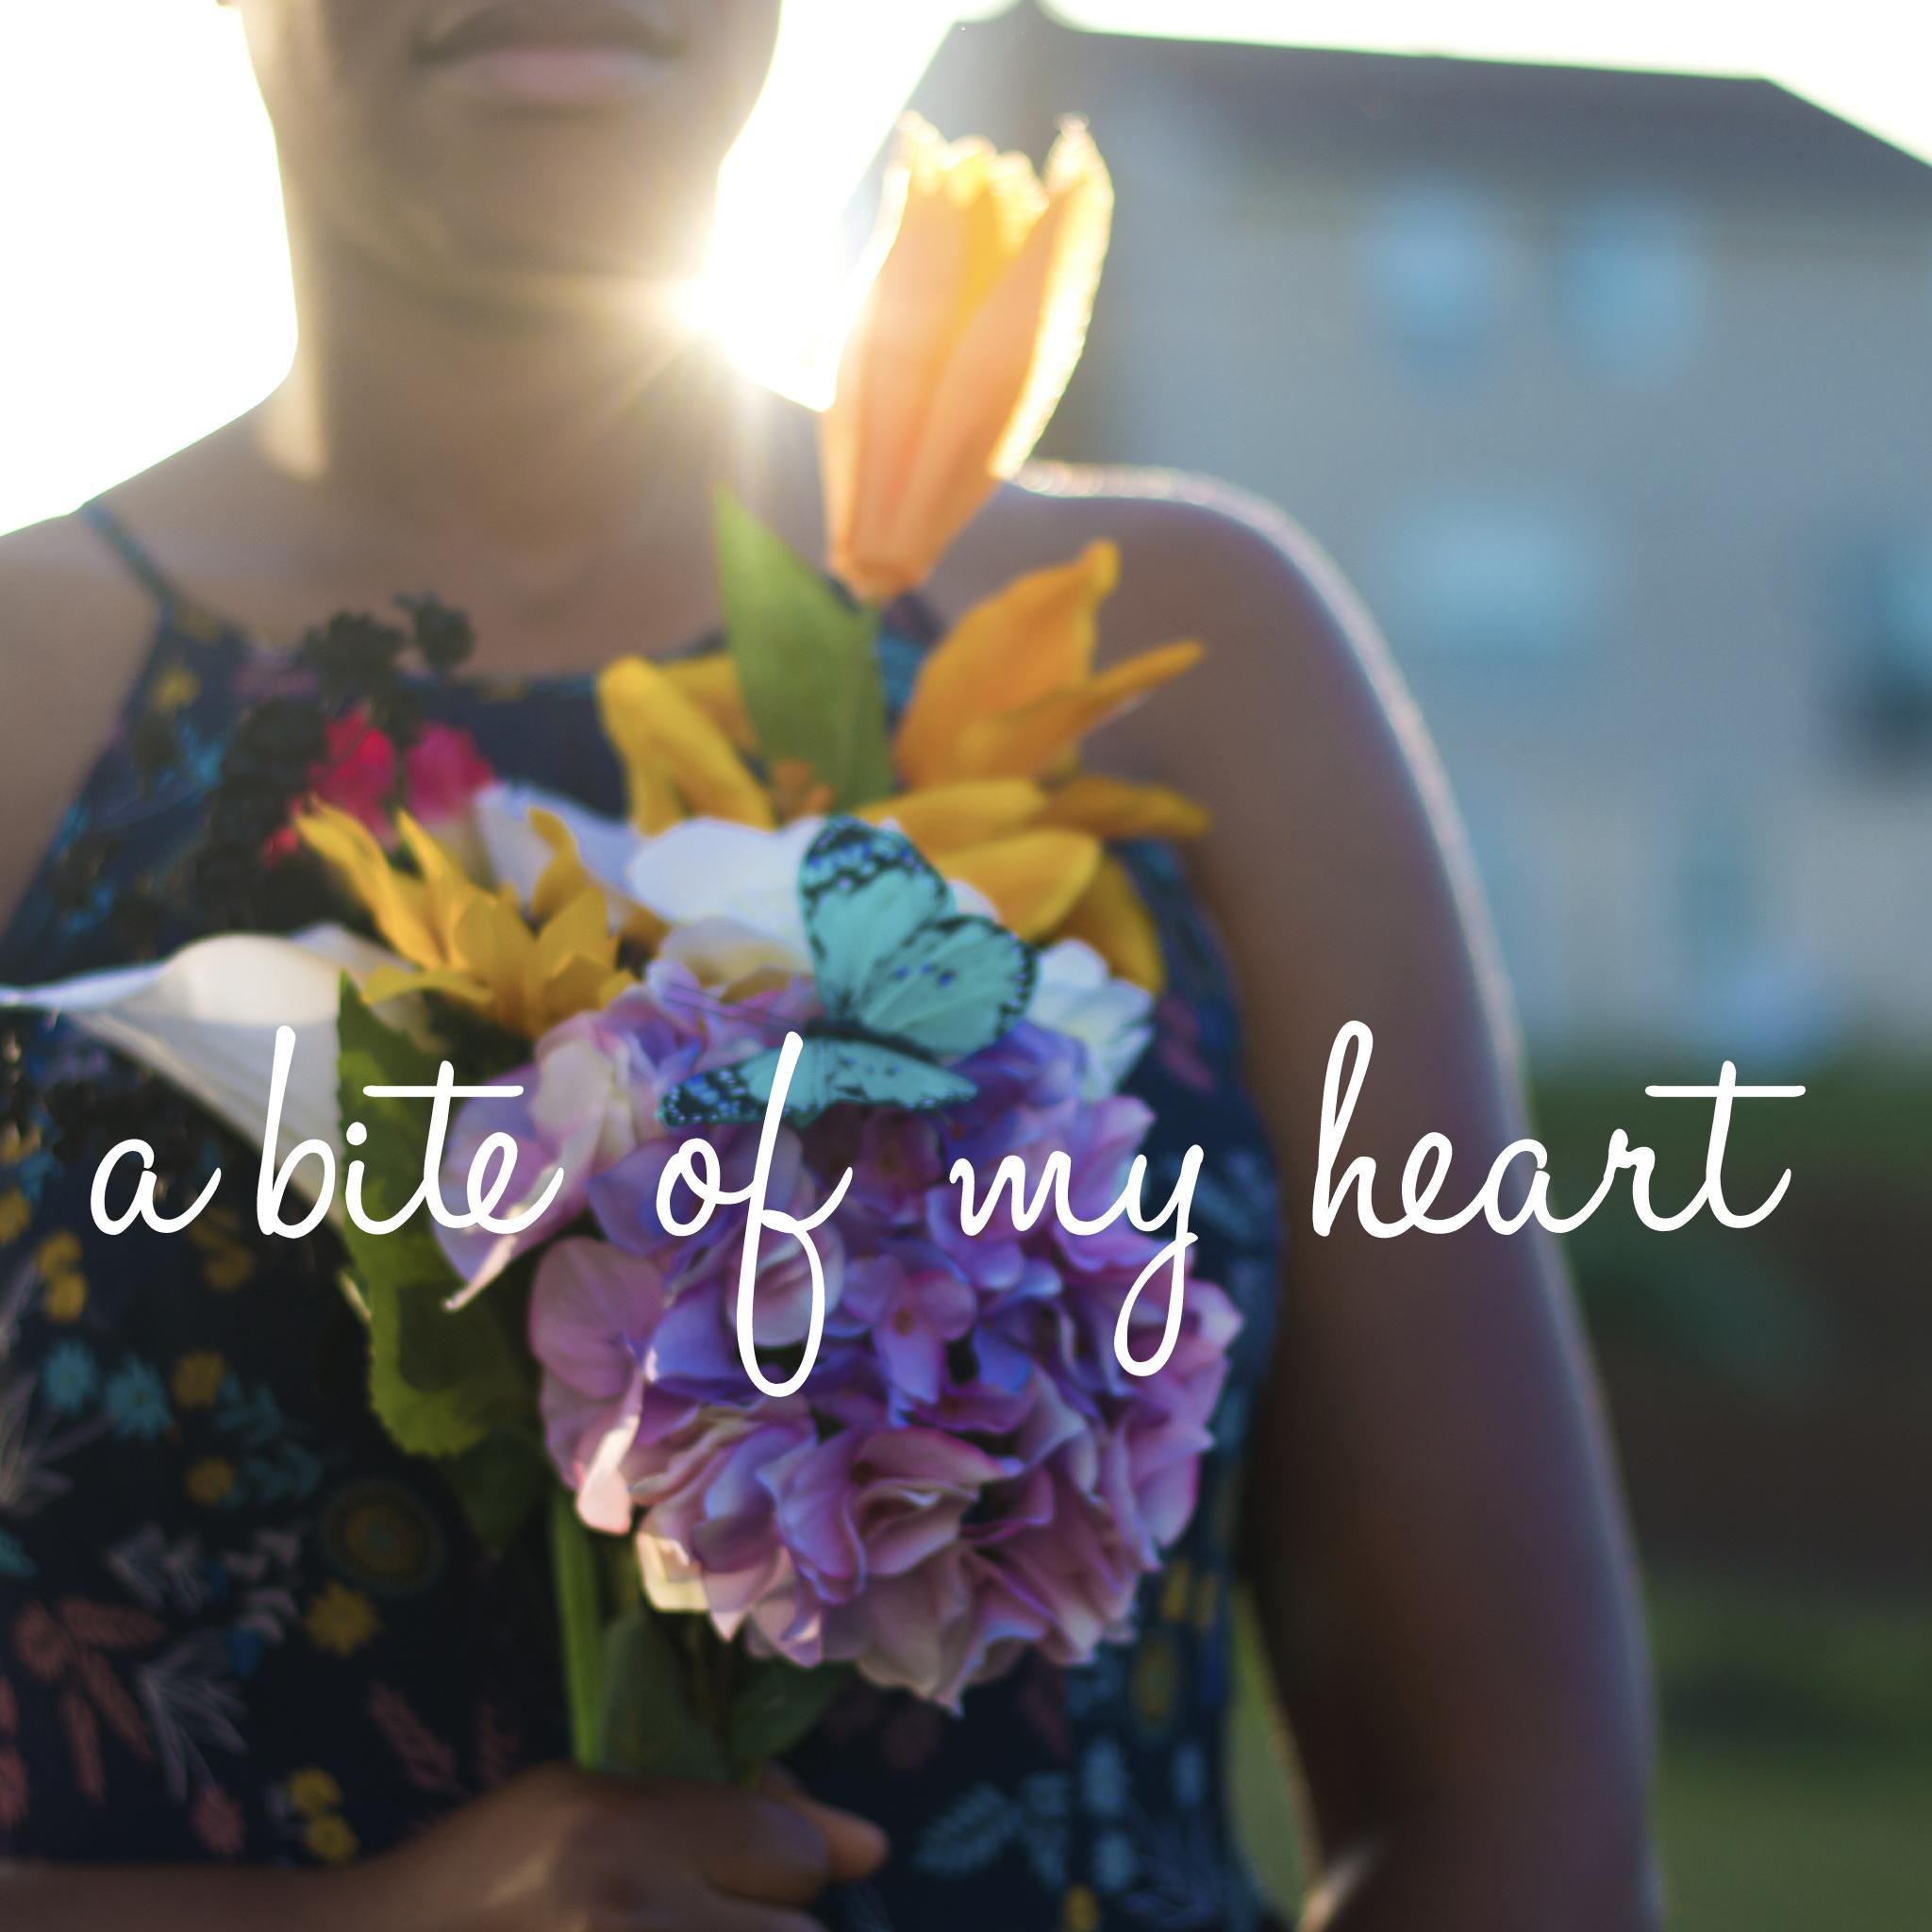 Alecia Renece - A Bite Of My Heart